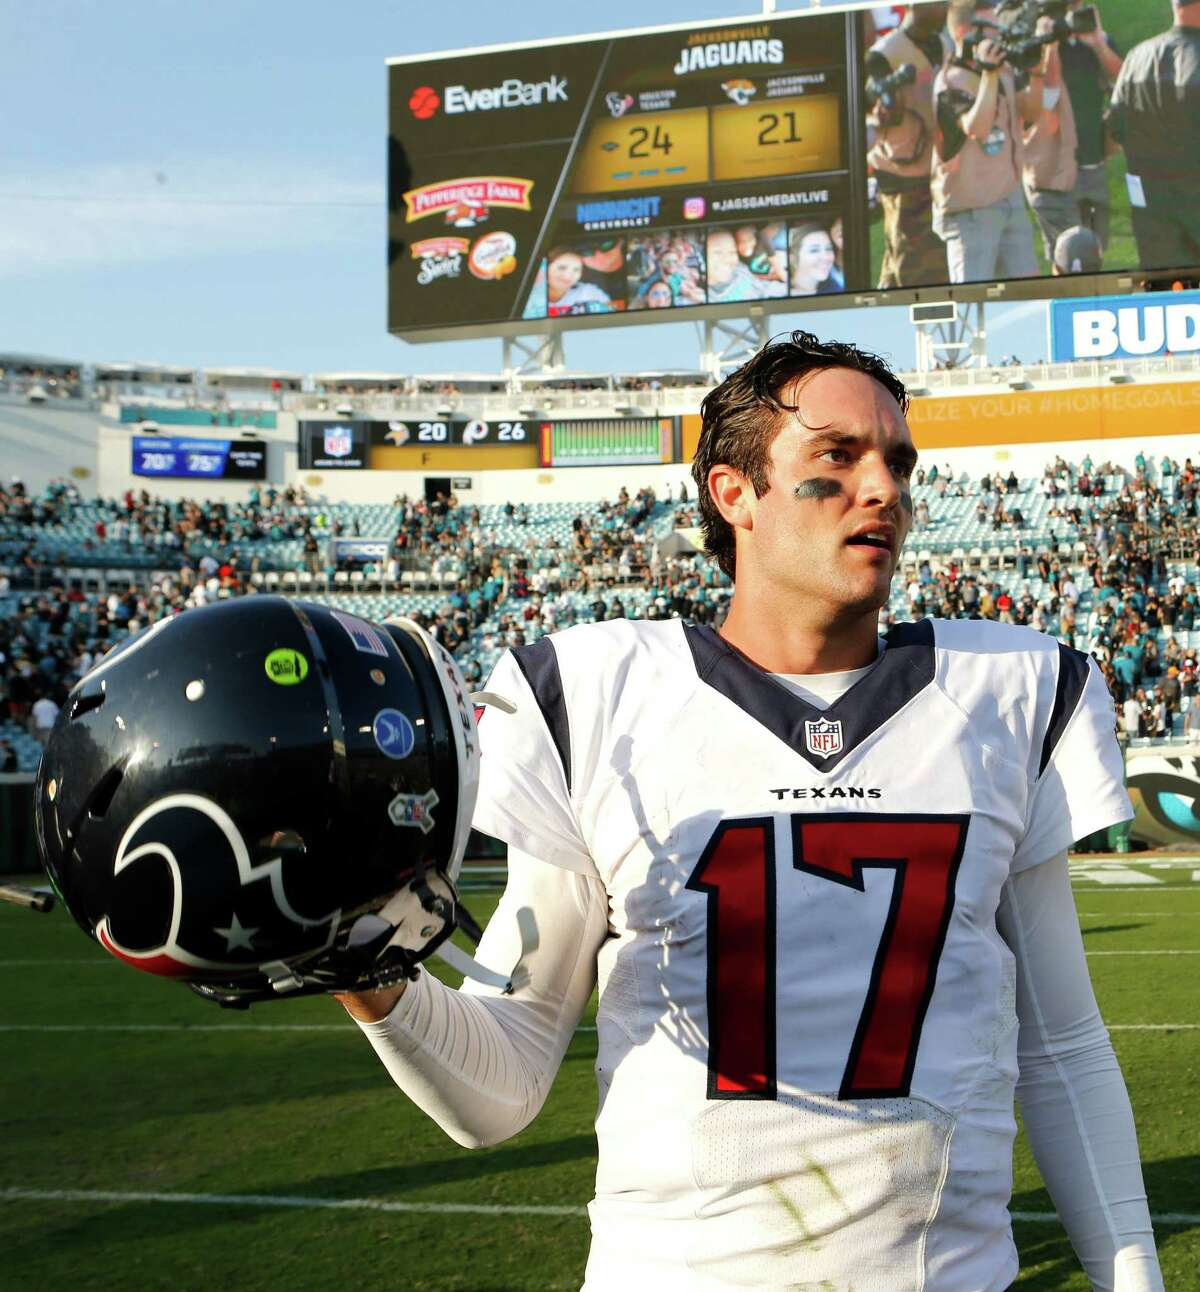 Texans QB Brock Osweiler, the starter against the Raiders, has thrown 15 touchdowns and 16 interceptions this season.